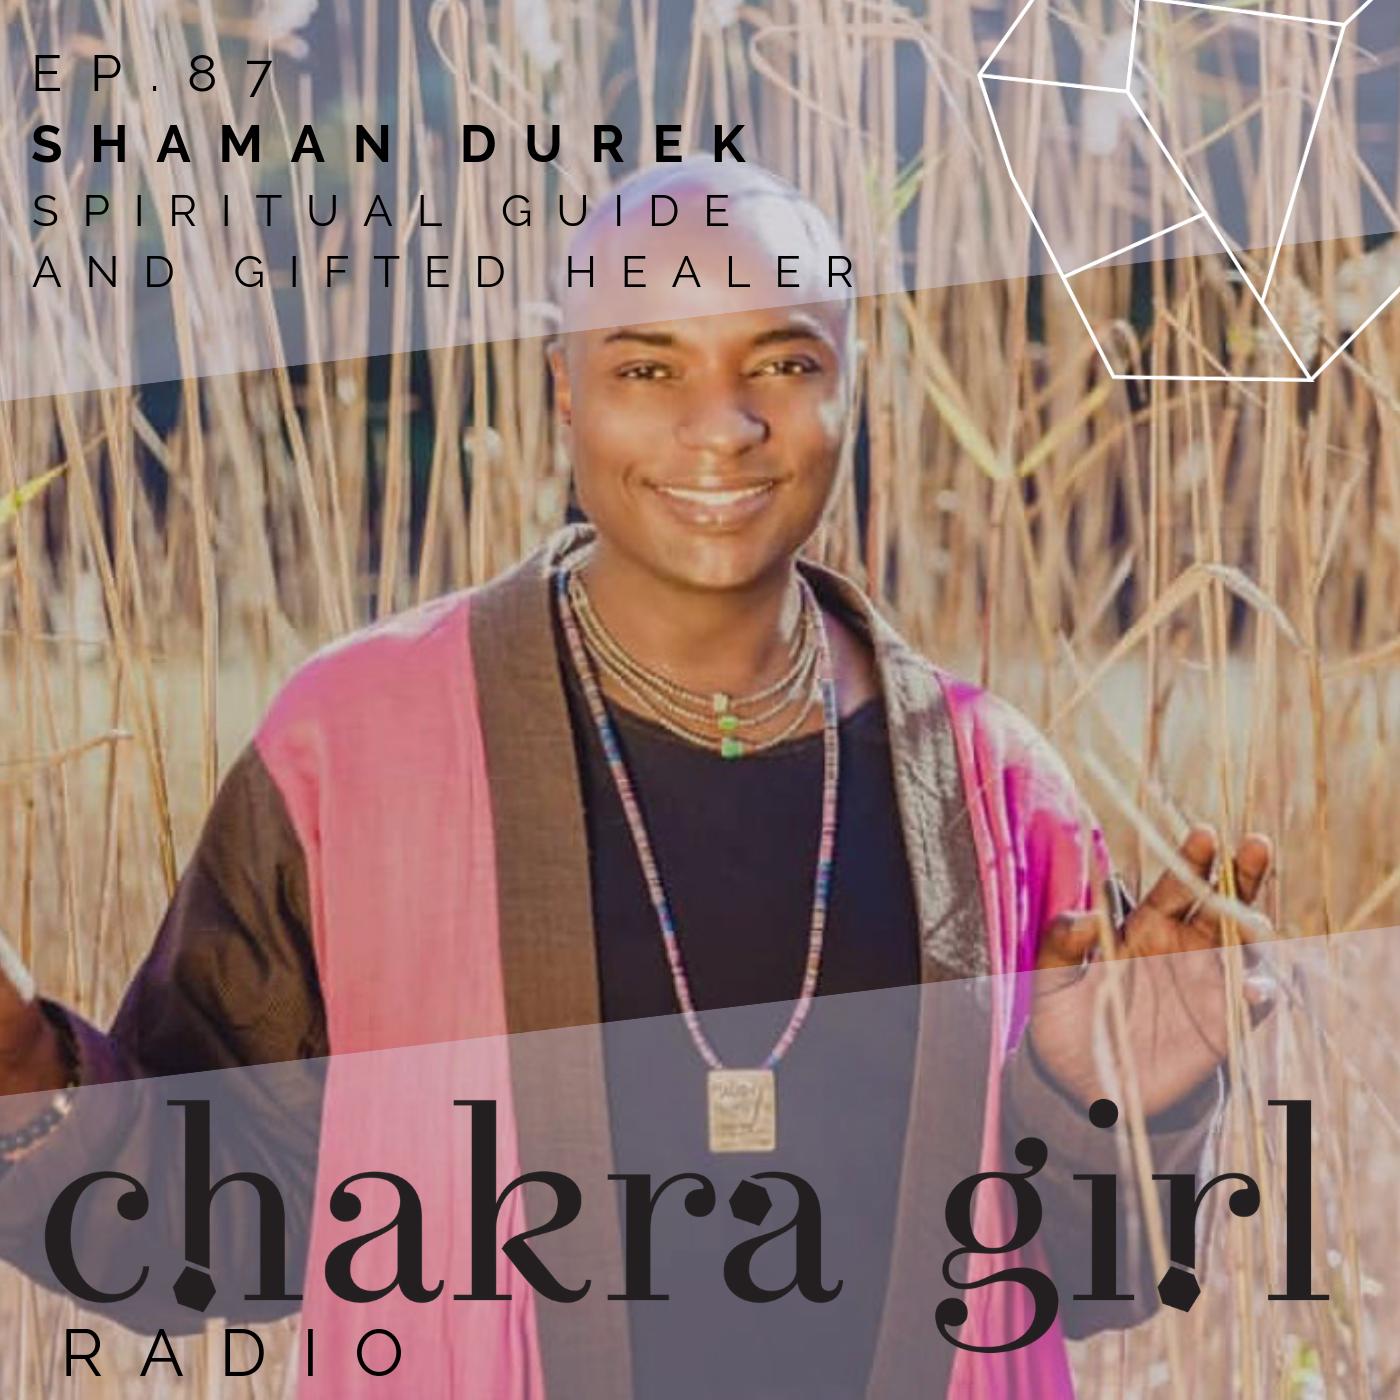 CHAKRA GIRL RADIO (42).png